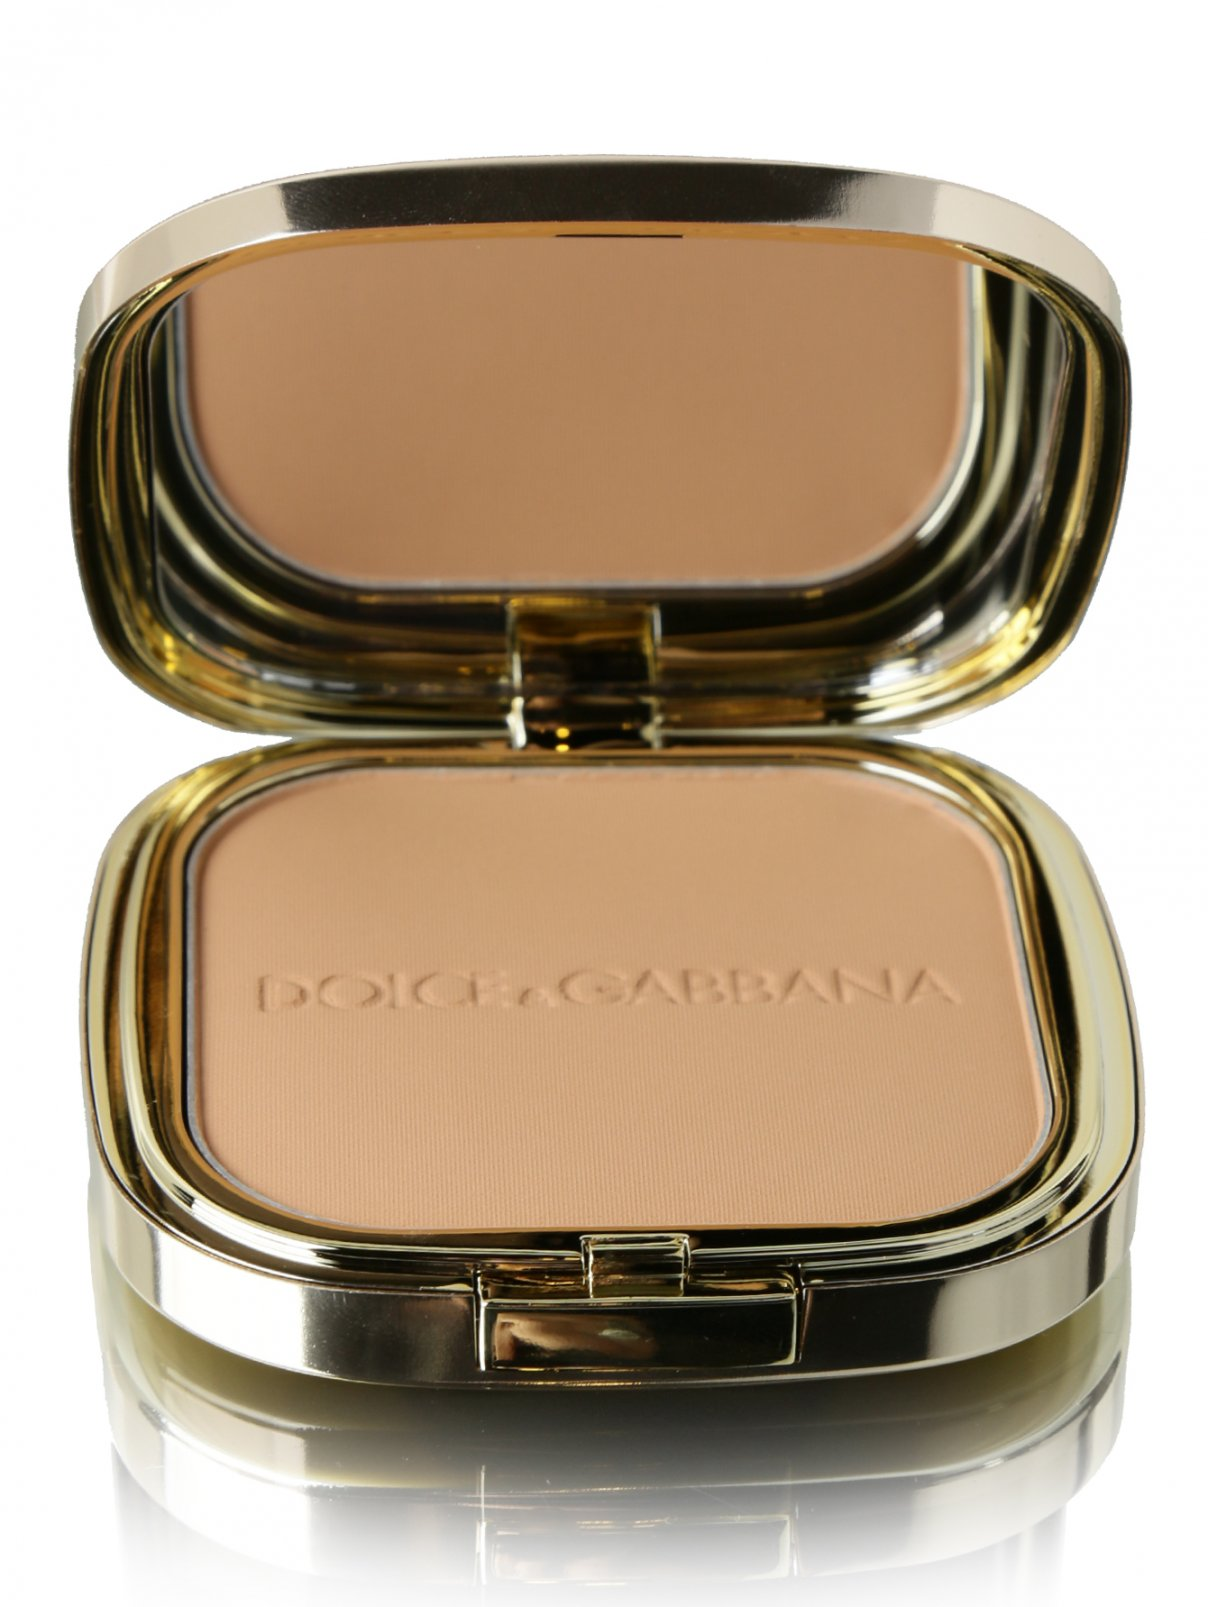 Компактная пудра, 5 Soft Sand, 15 г Dolce & Gabbana  –  Общий вид